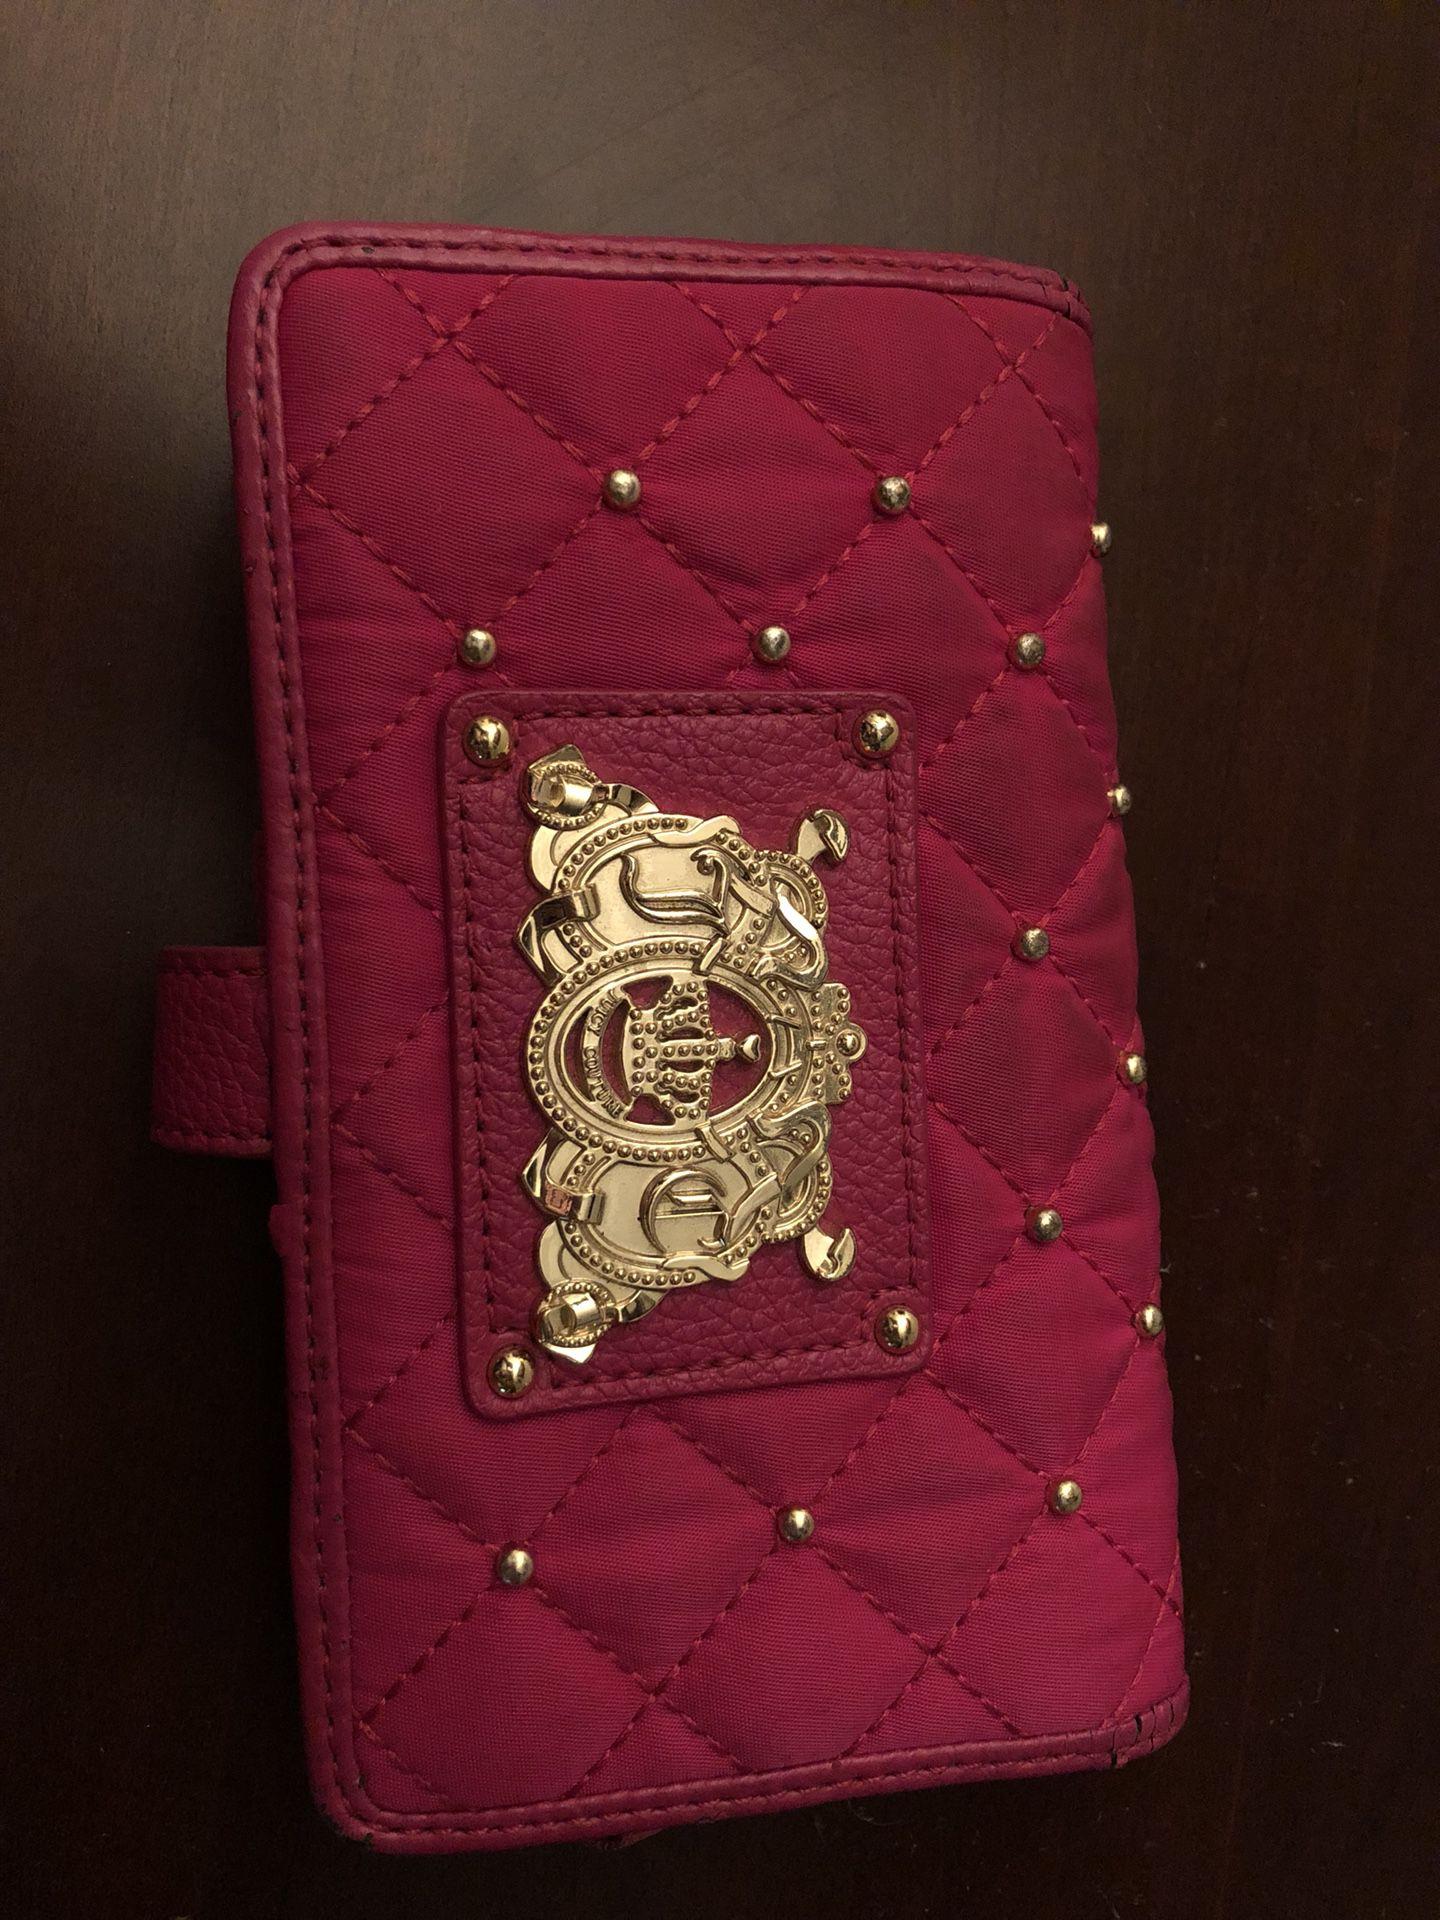 Juicy Couture Wallet..